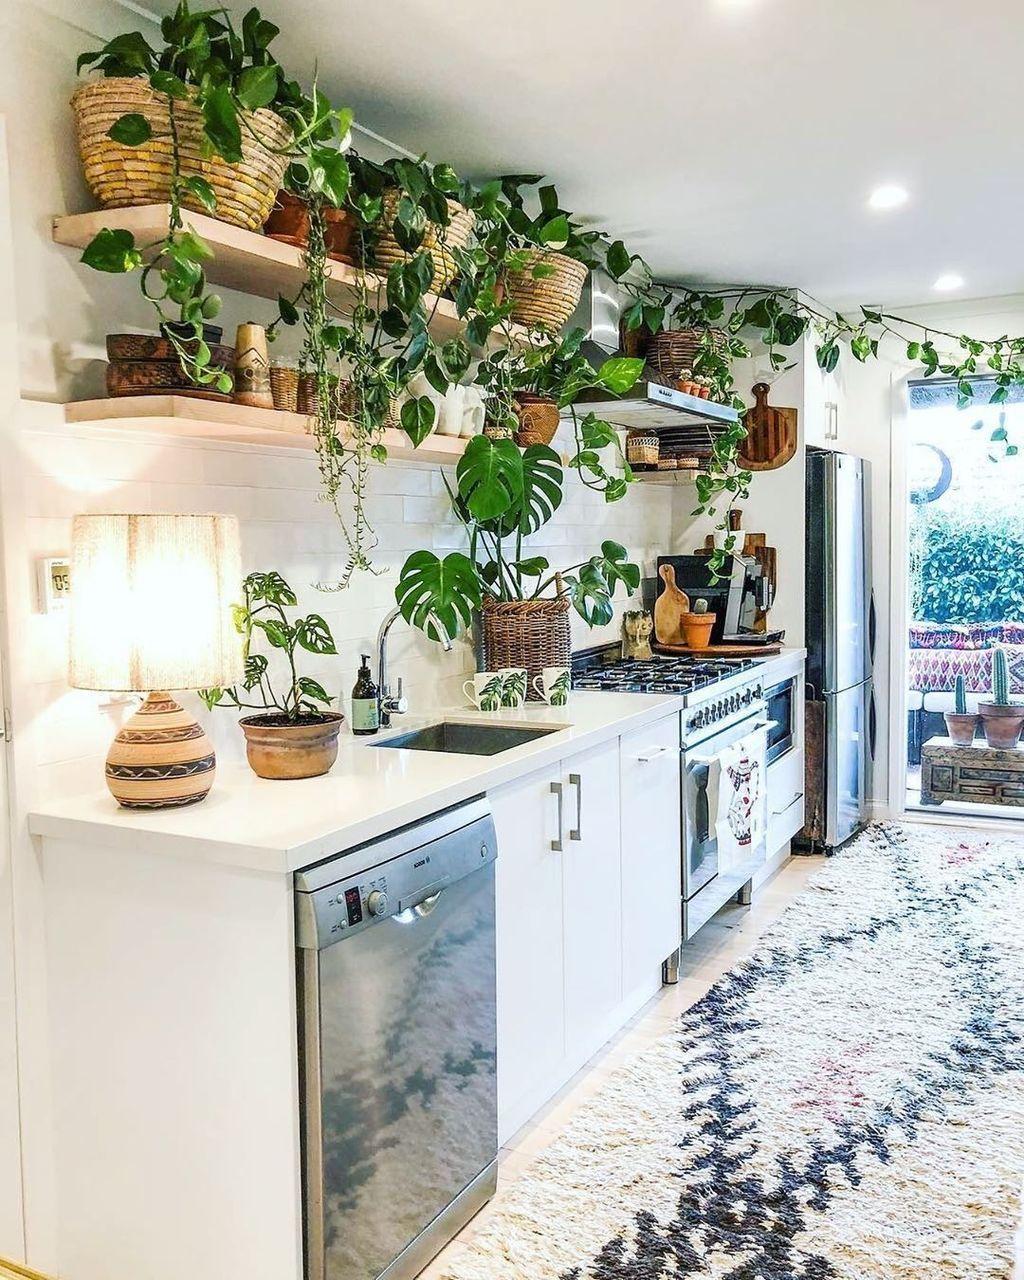 36 lovely bohemian kitchen decor ideas that you will like bohemian kitchen decor bohemian on kitchen interior boho id=27015